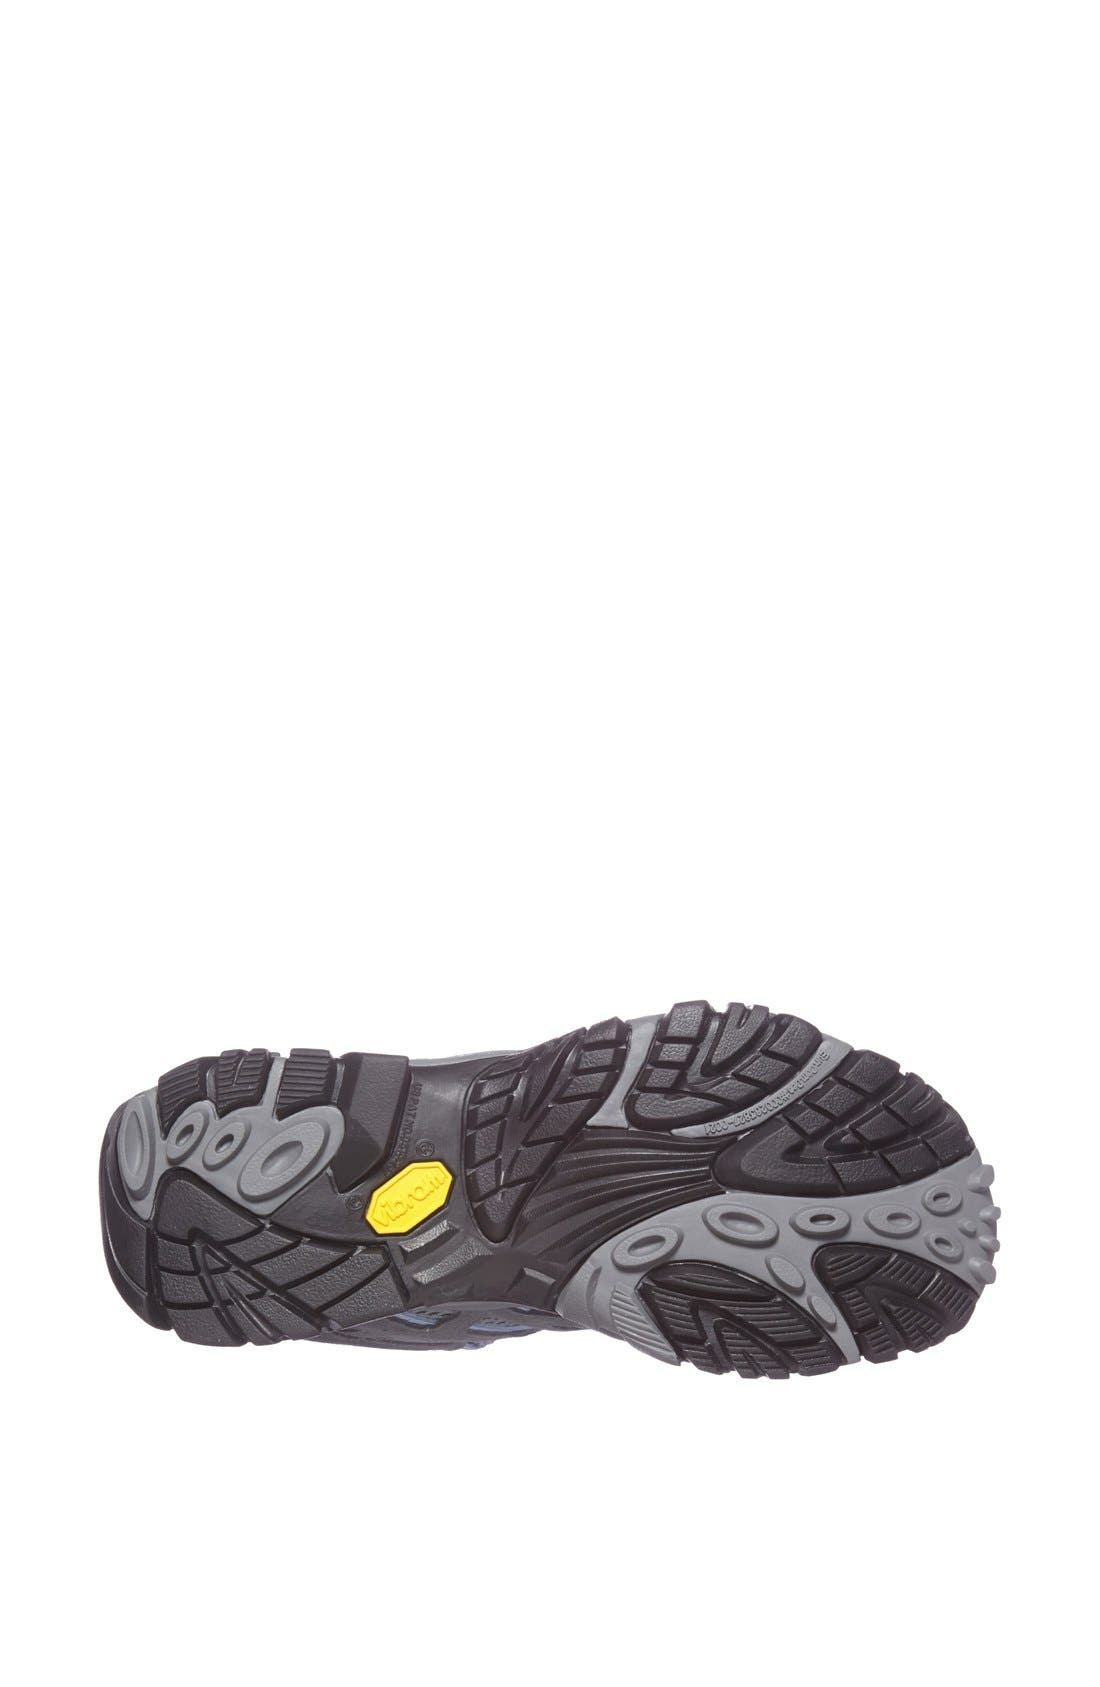 'Moab - Mid' Waterproof Hiking Boot,                             Alternate thumbnail 3, color,                             020